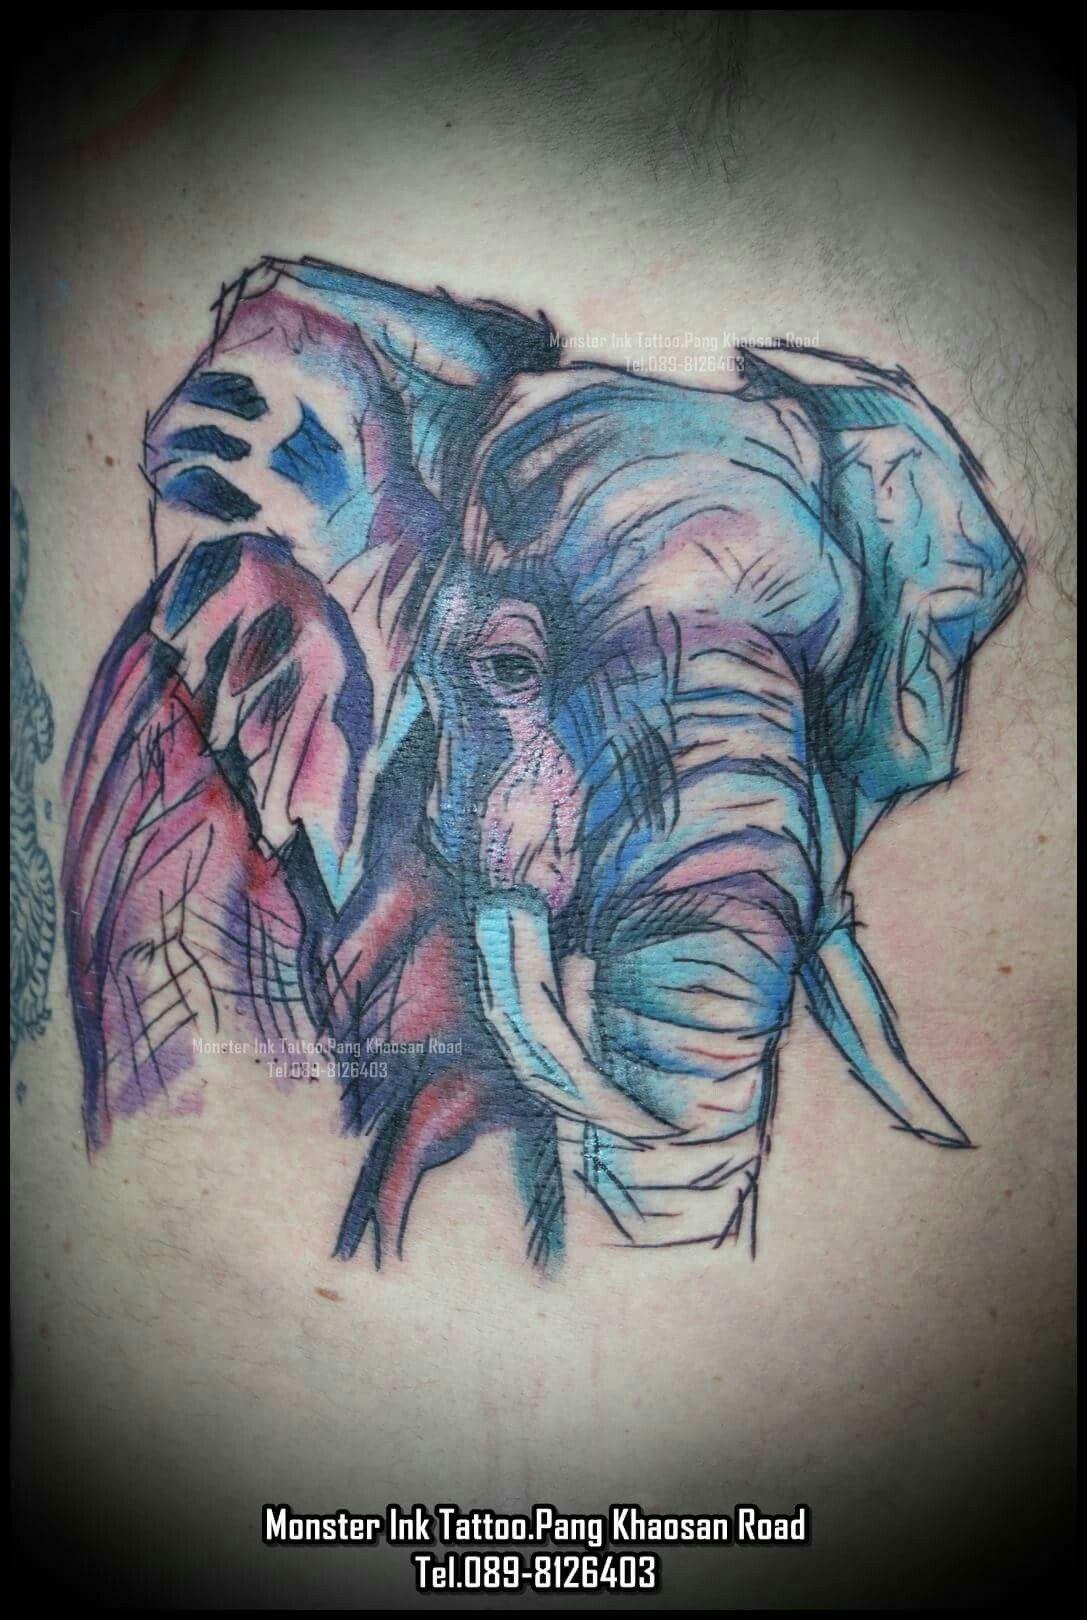 Elephant #Watercolor #Tattoo #Bangkok #Khaosan Rd. #Thailand Monster ...